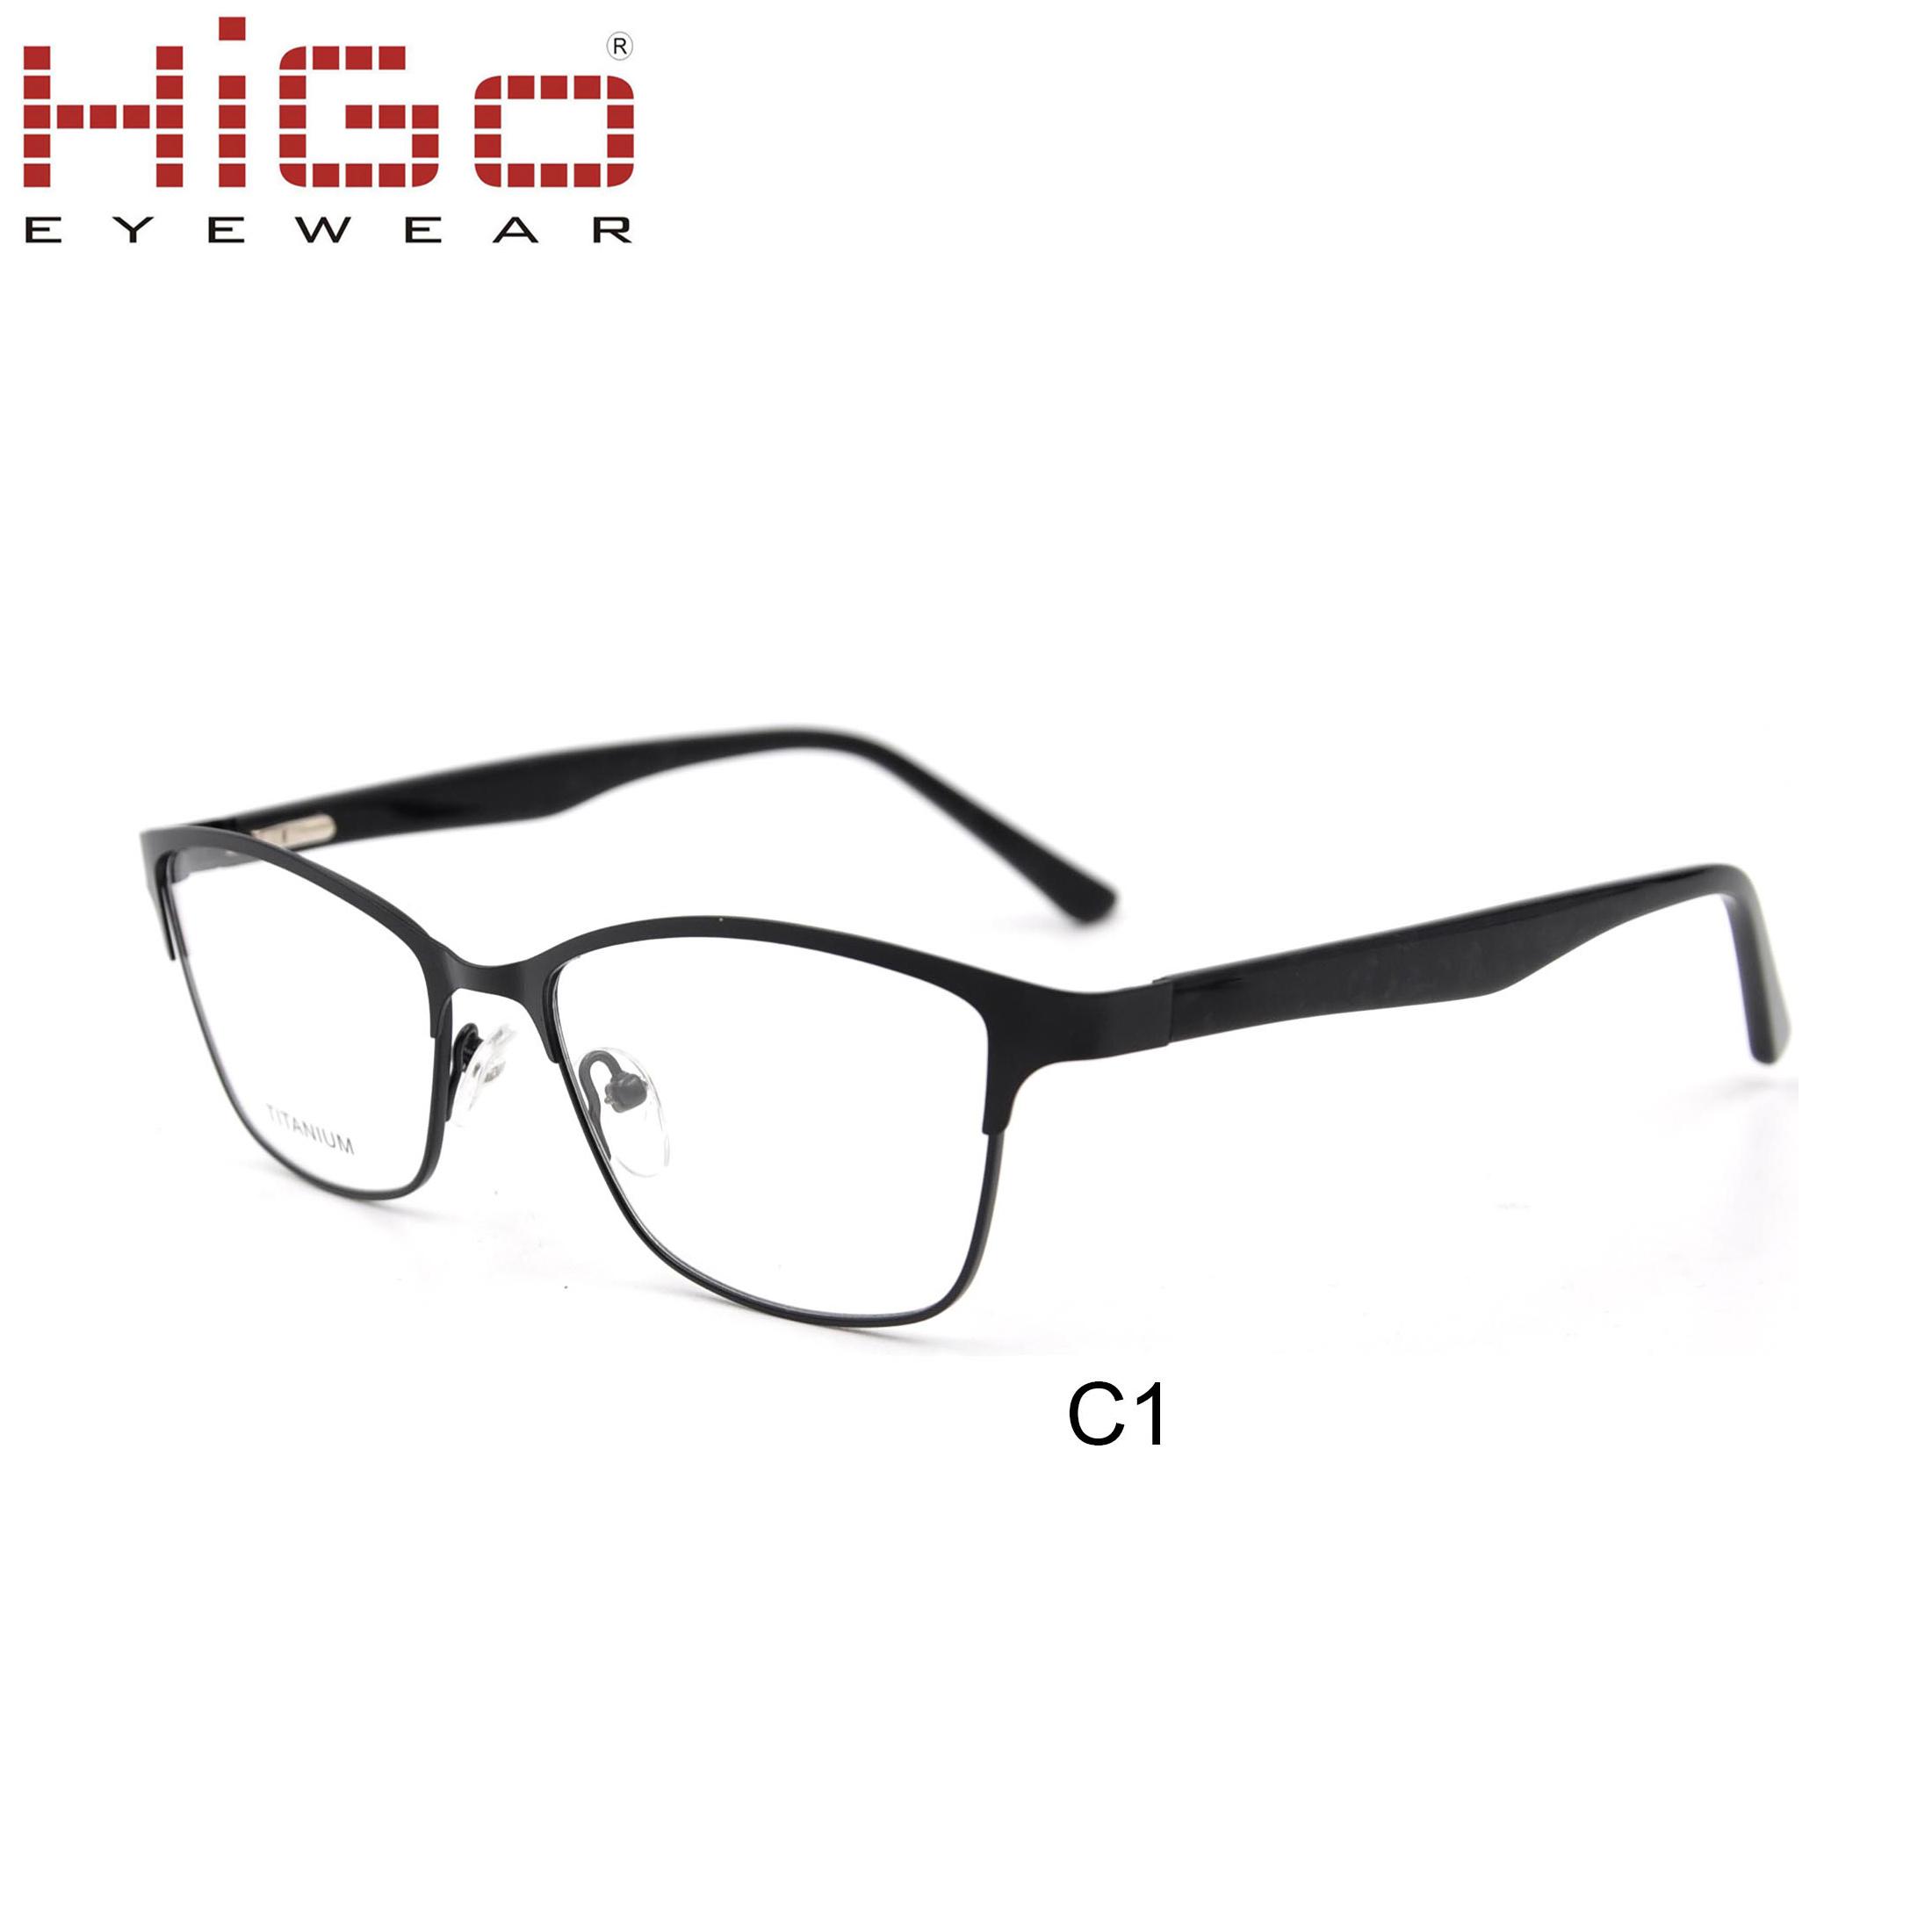 6c67f3cfd3 High Quality Prescription Eyewear Sport Eyeglasses with Titanium Optical  Glasses Frame Men